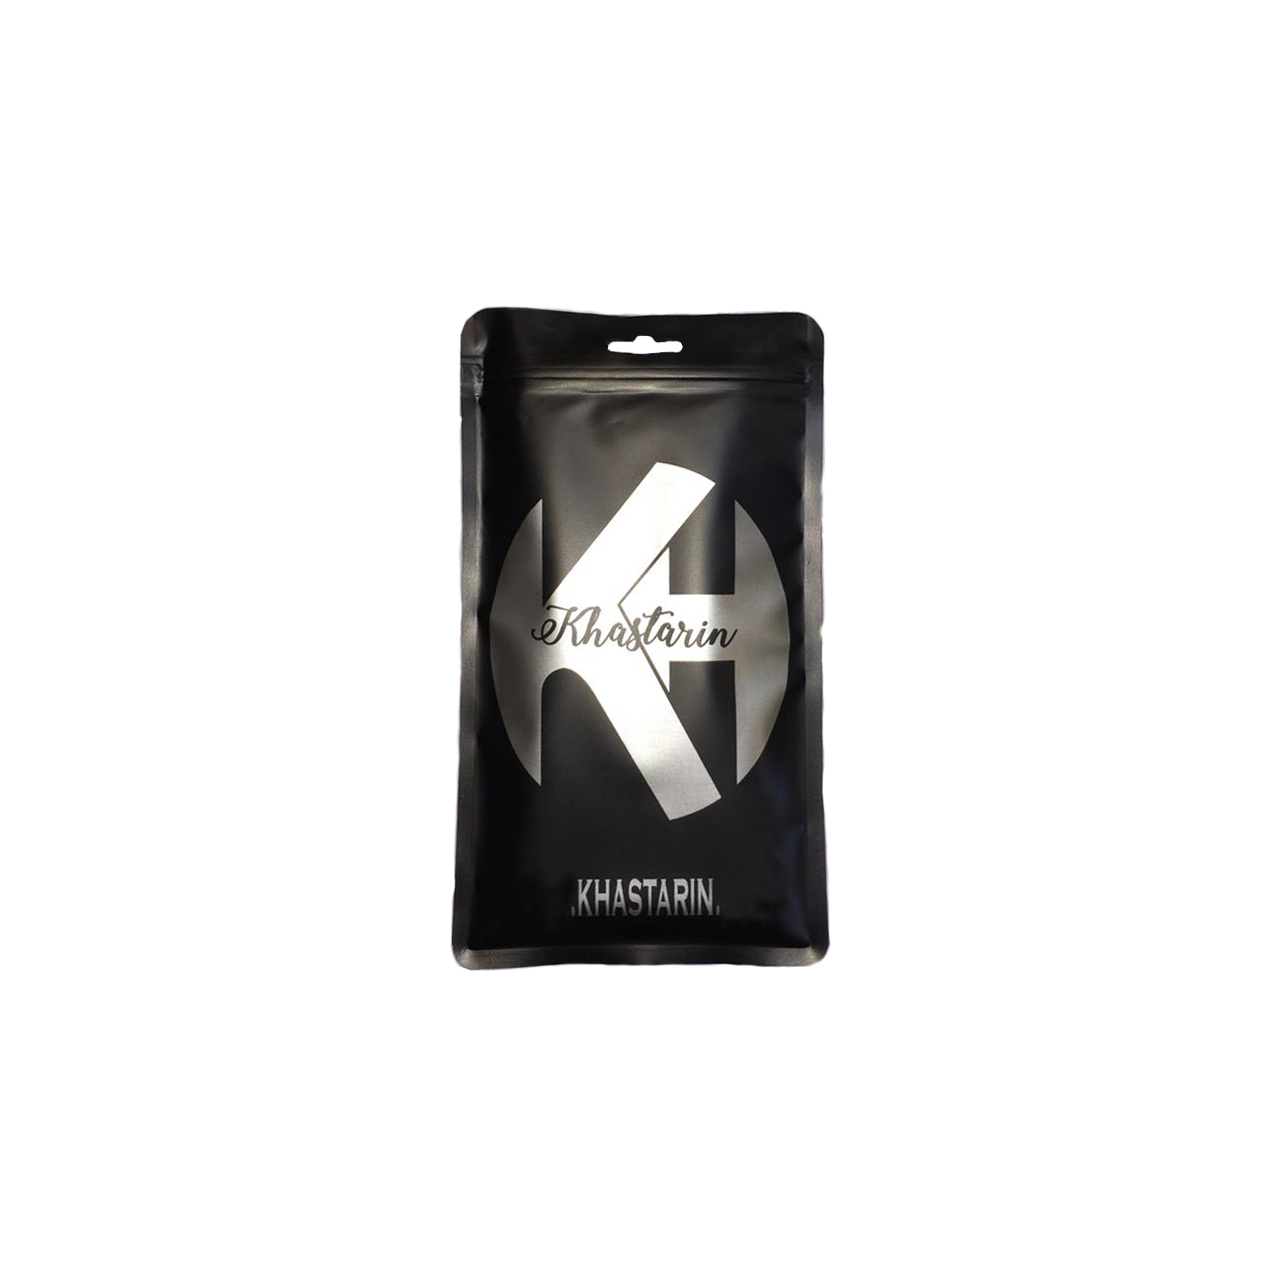 کاور کی اچ کد C19 مناسب برای گوشی موبایل هوآوی Mate 10 Pro